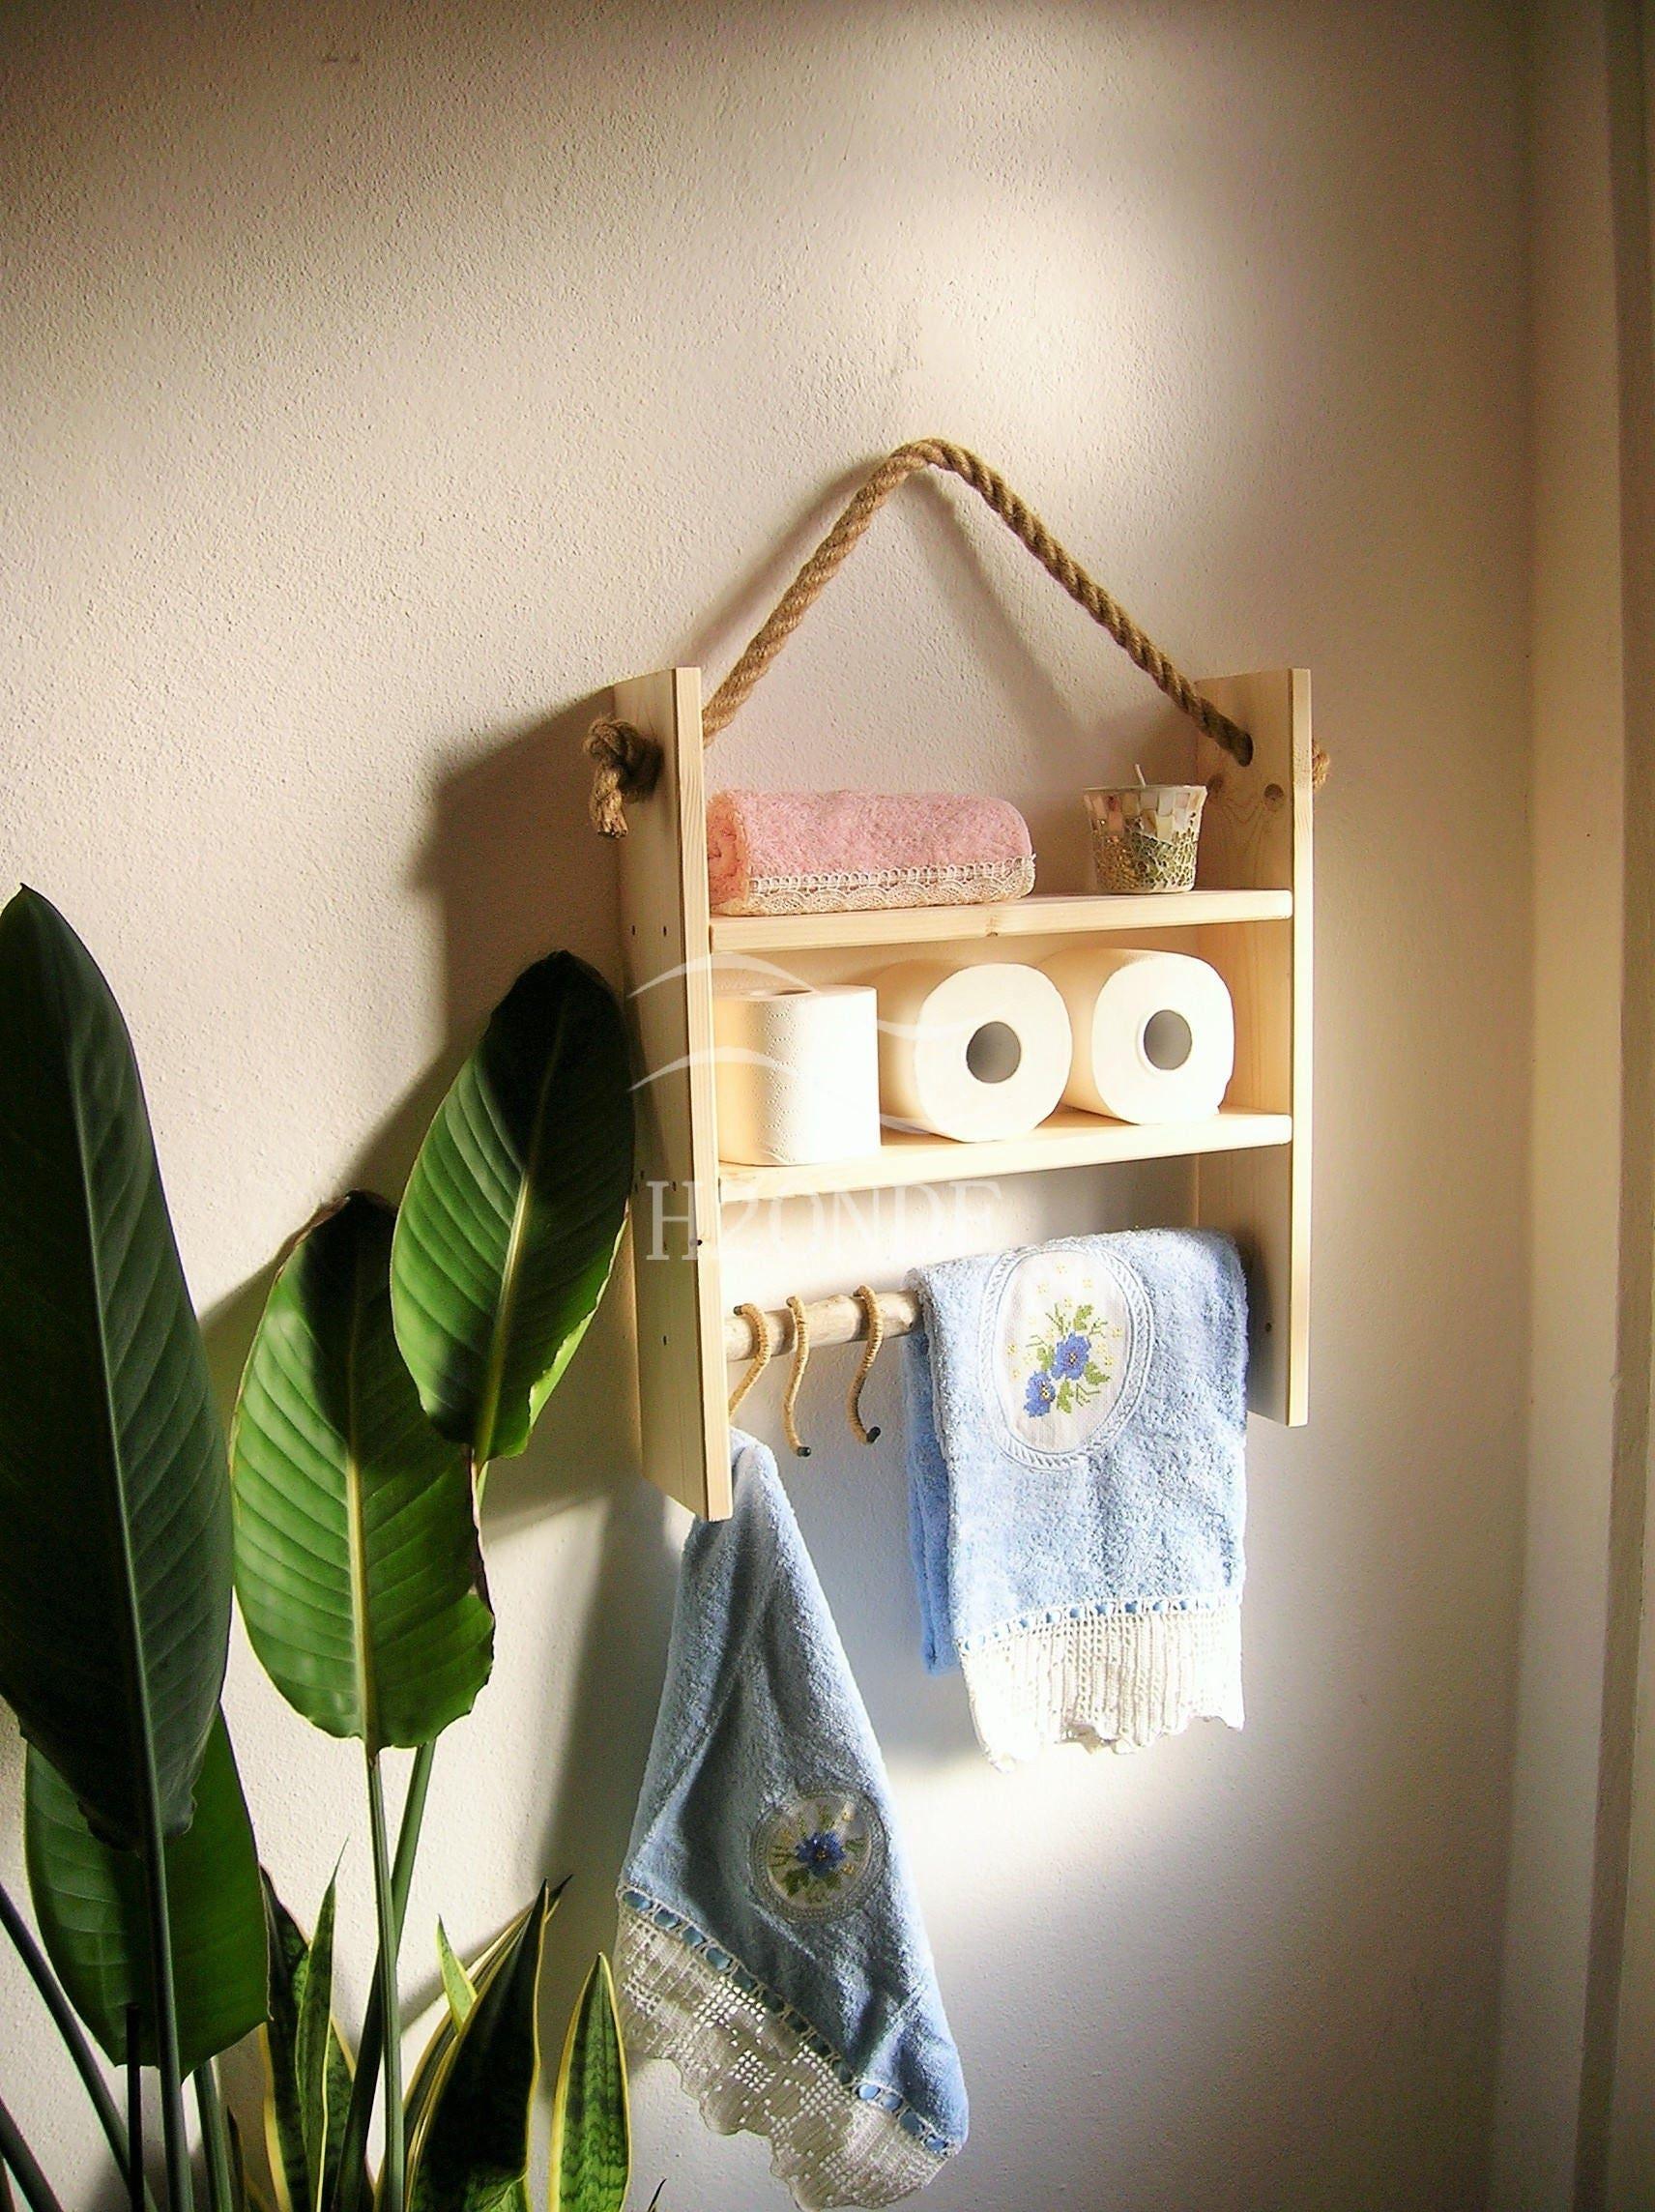 Rustikale Holz Wand Regal Bad Küche Wand Regal Display